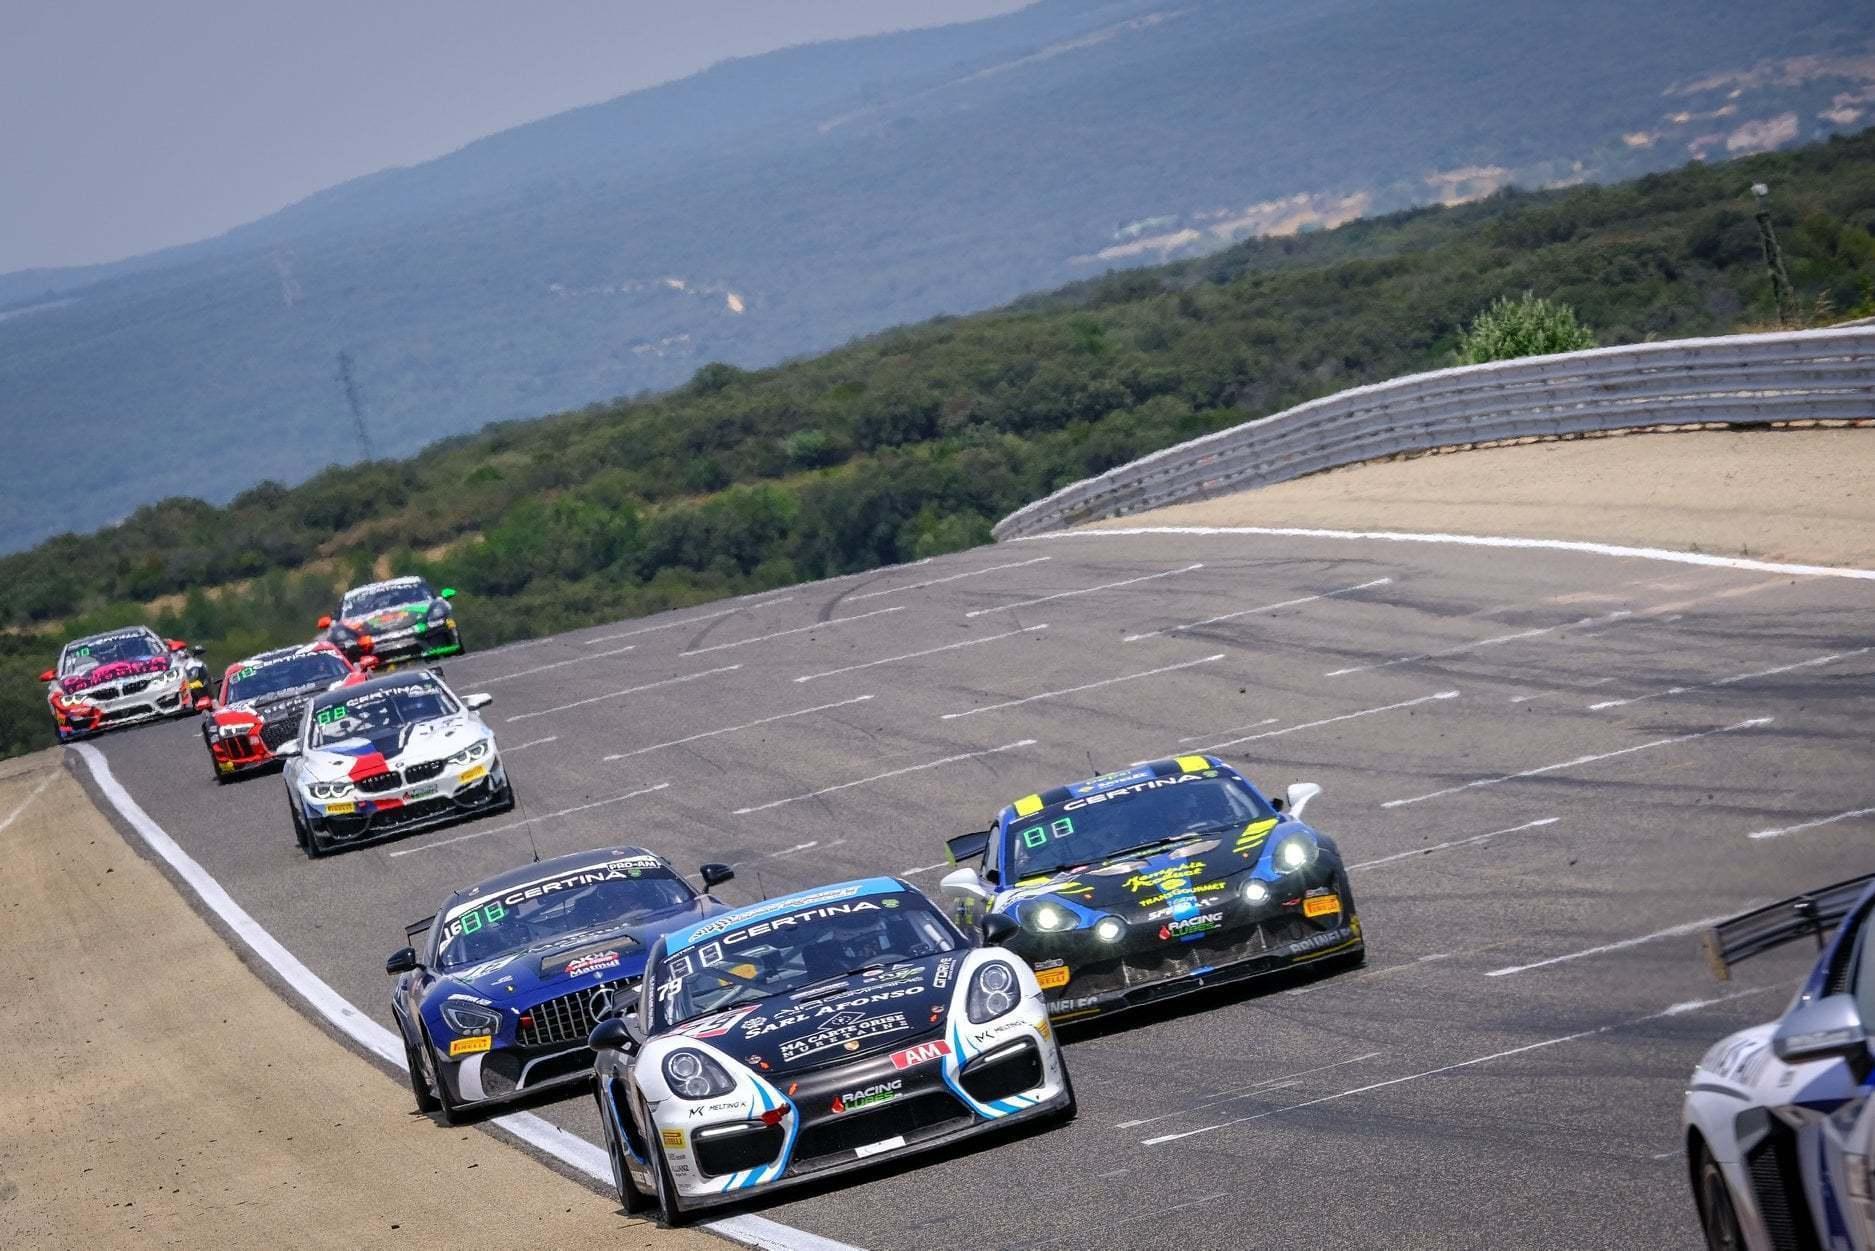 FFSA GT: CMR reprend la main Lédenon ! (Course 2) 19